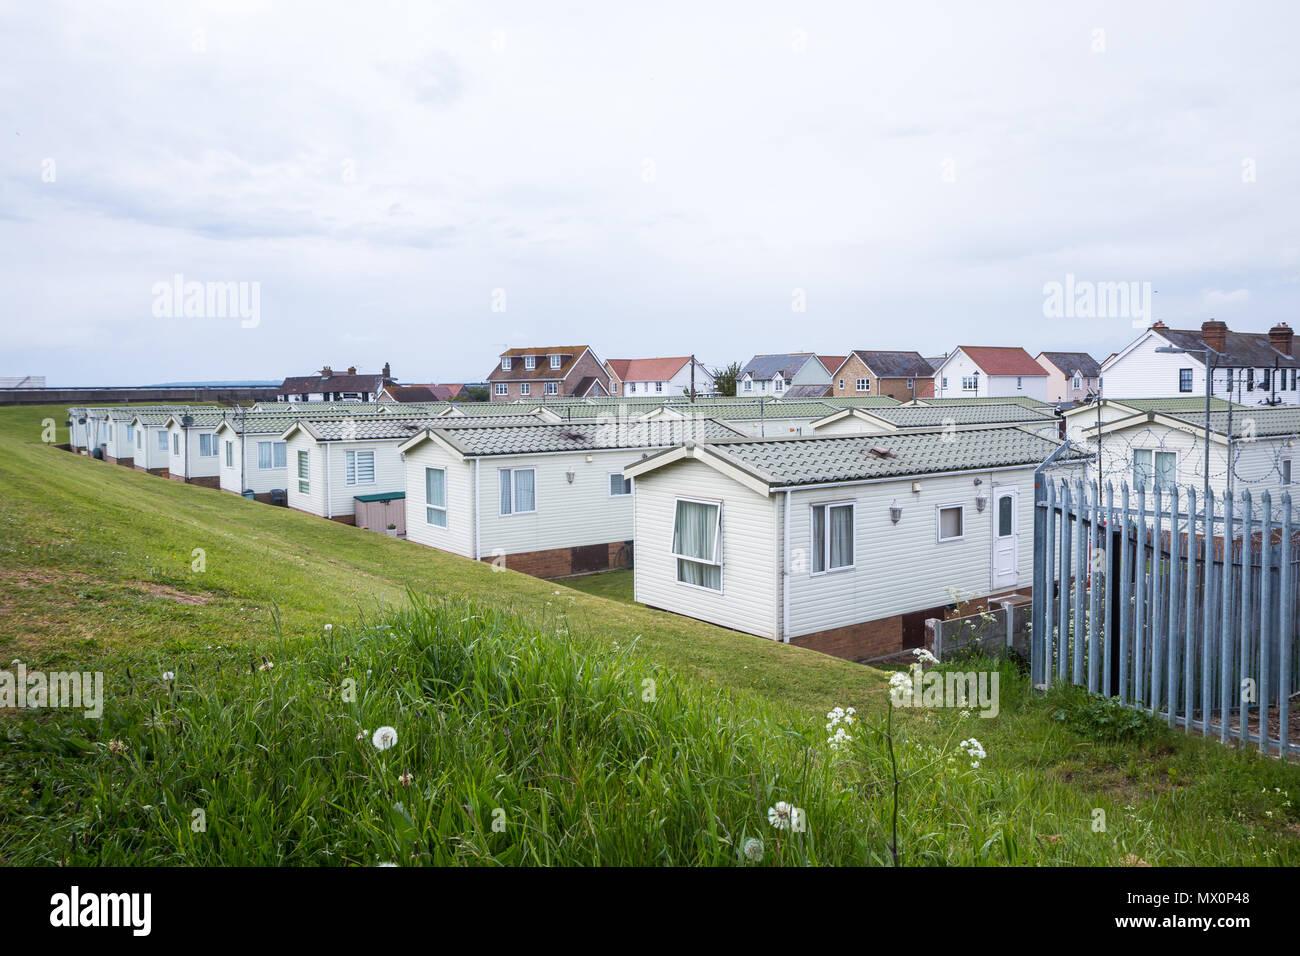 Caravan camp on Canvey island - Stock Image